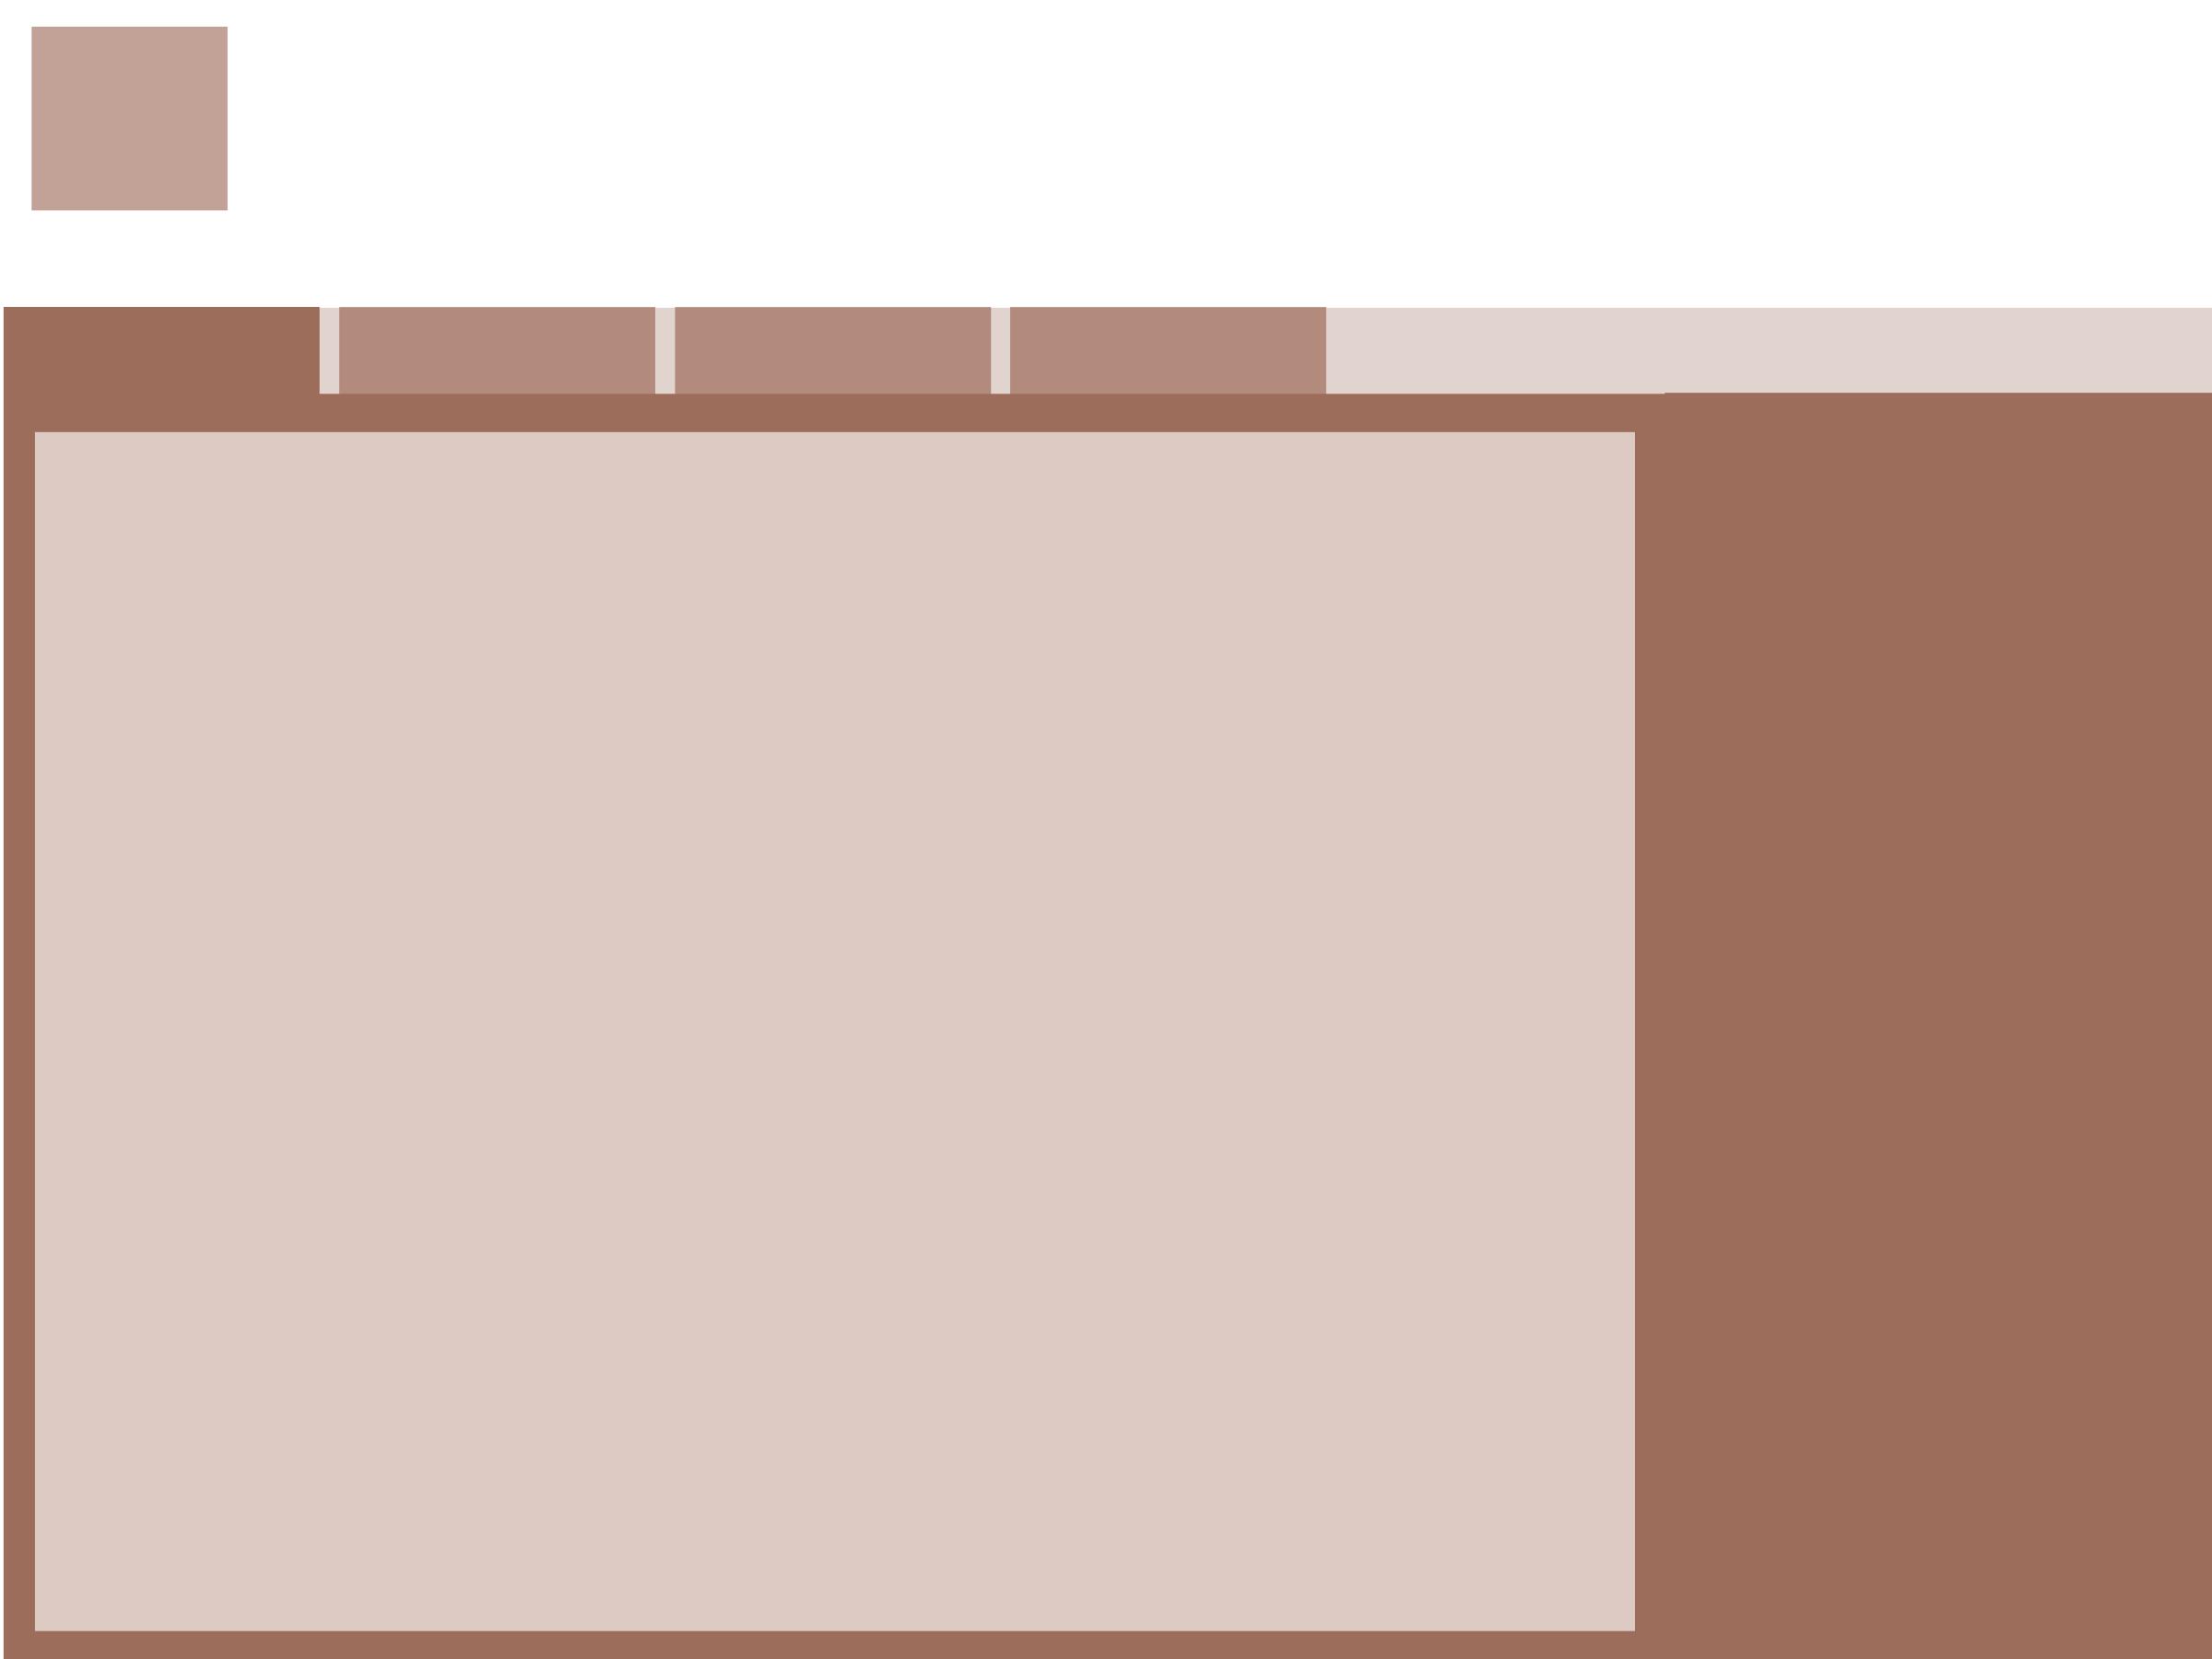 Clipart - Basic Website layout